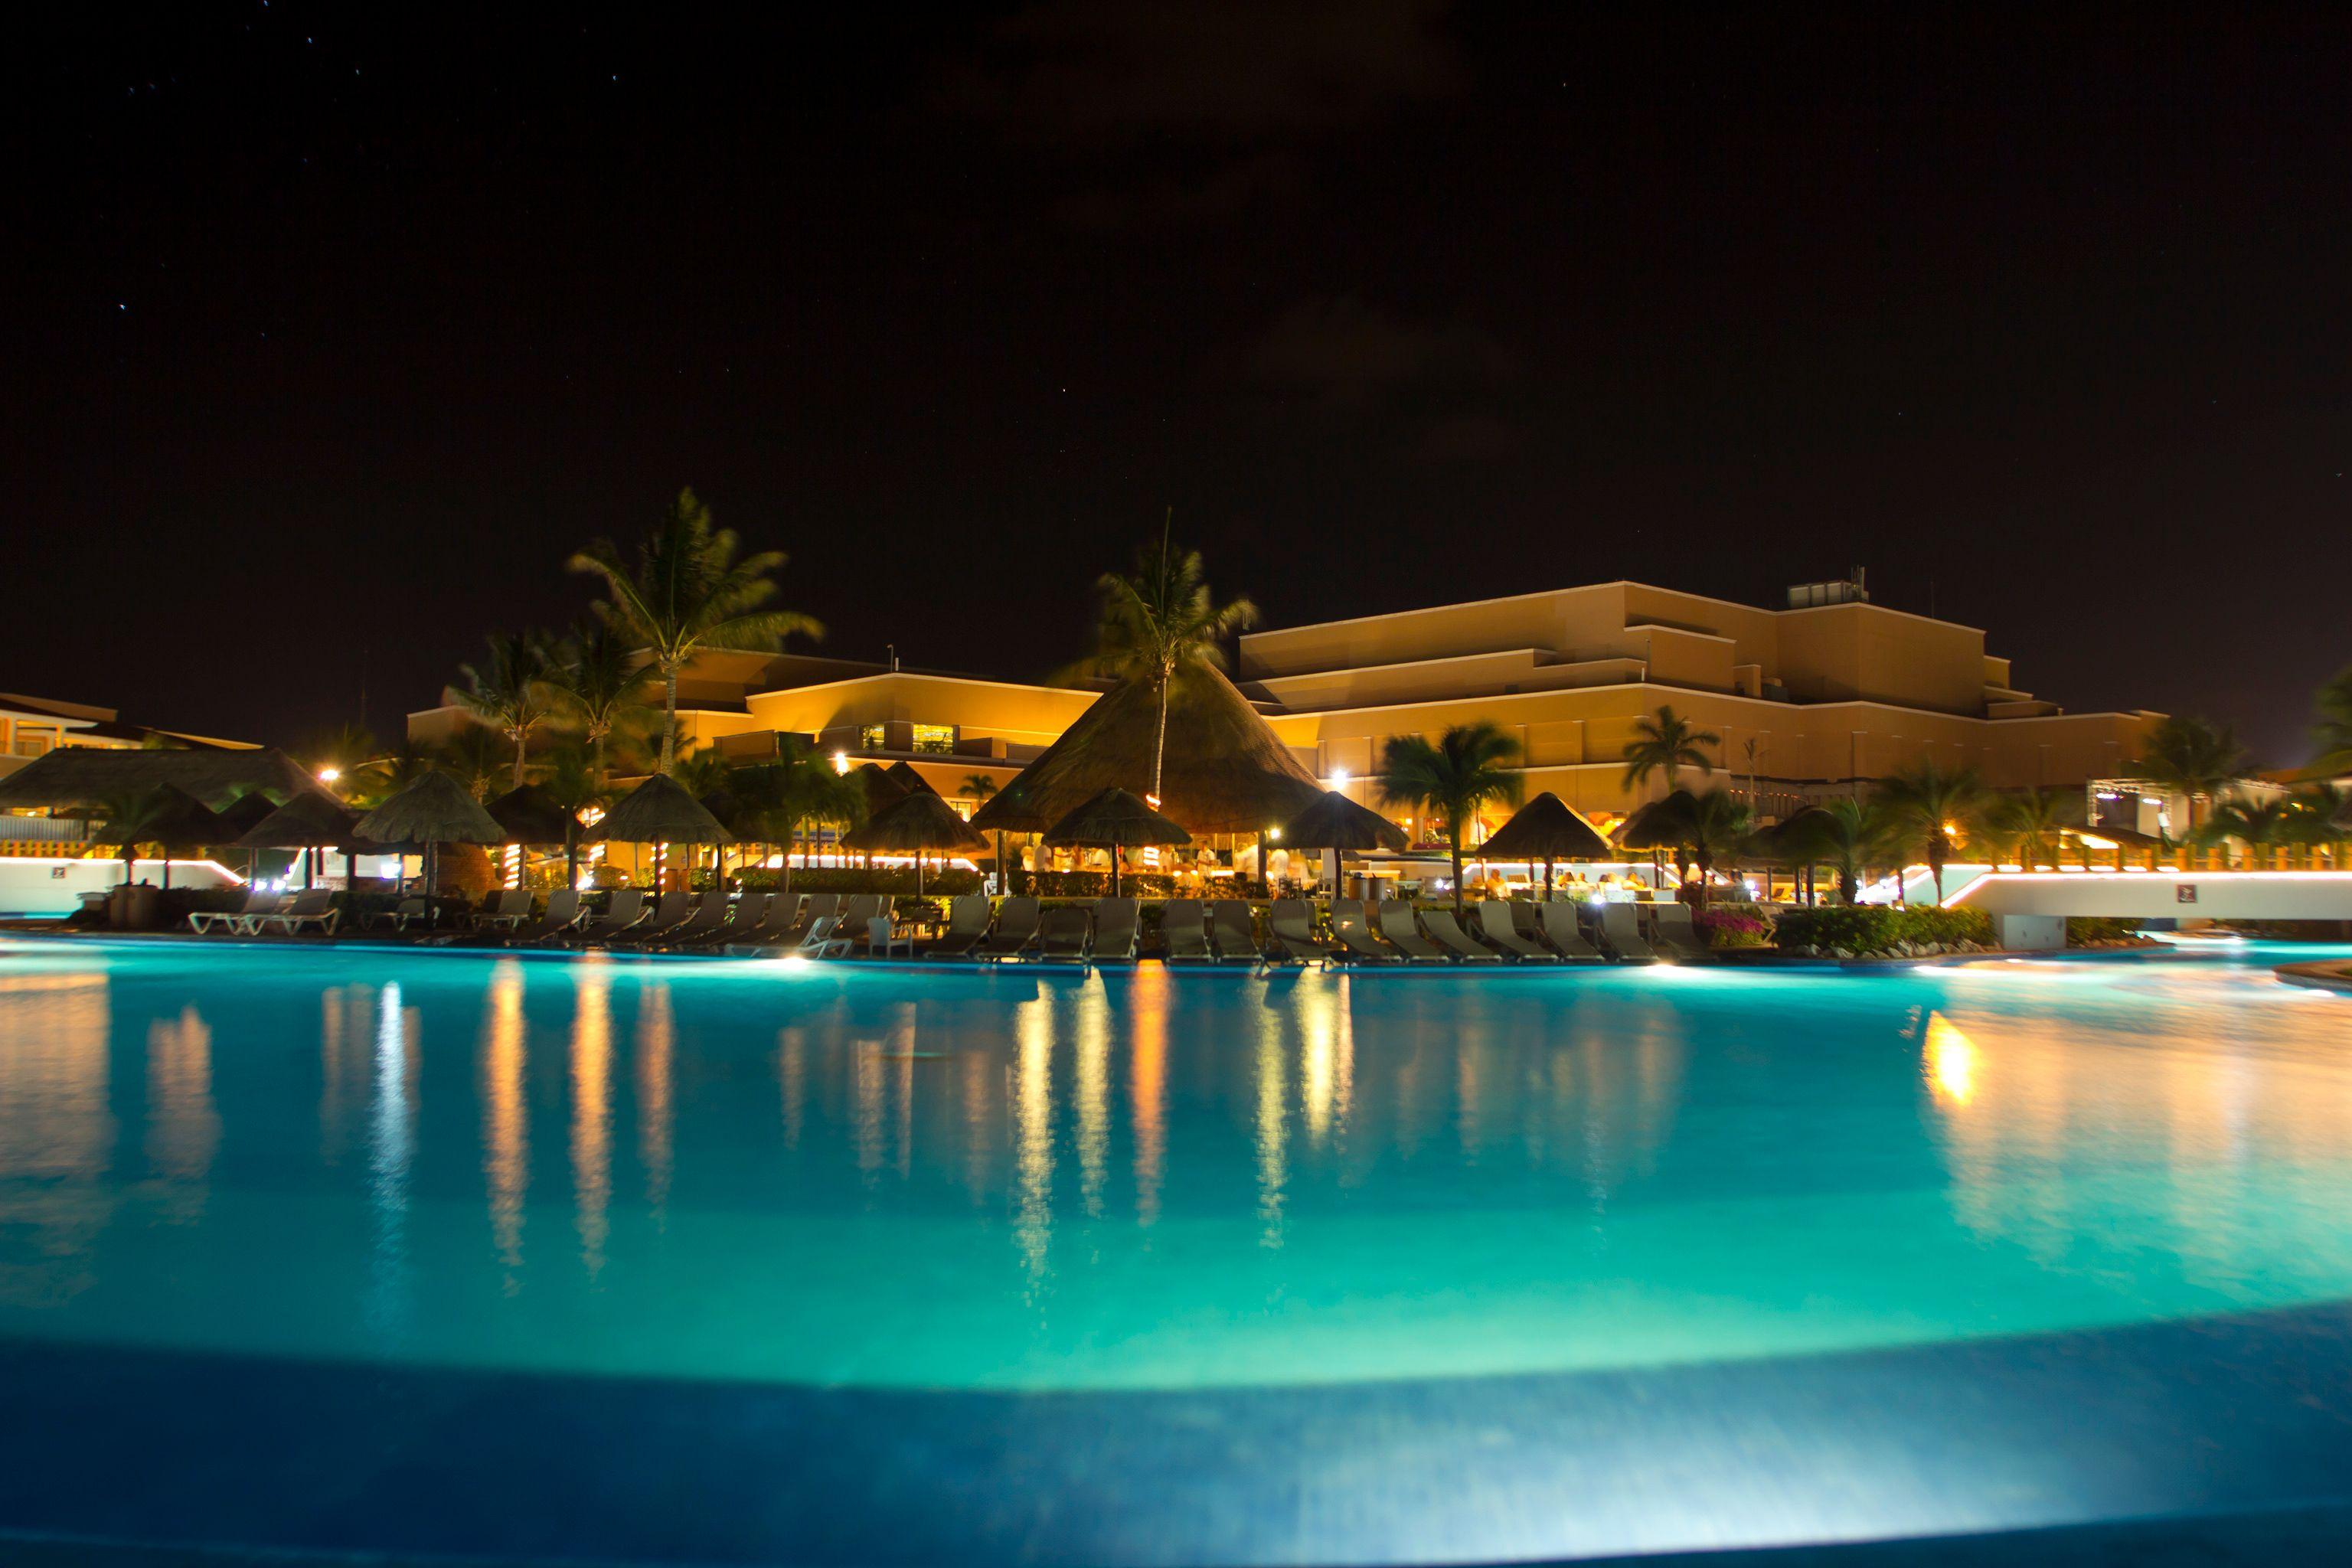 Moon Palace, Cancun Mexico | Garret&Amber Vaca 2014 | Pinterest